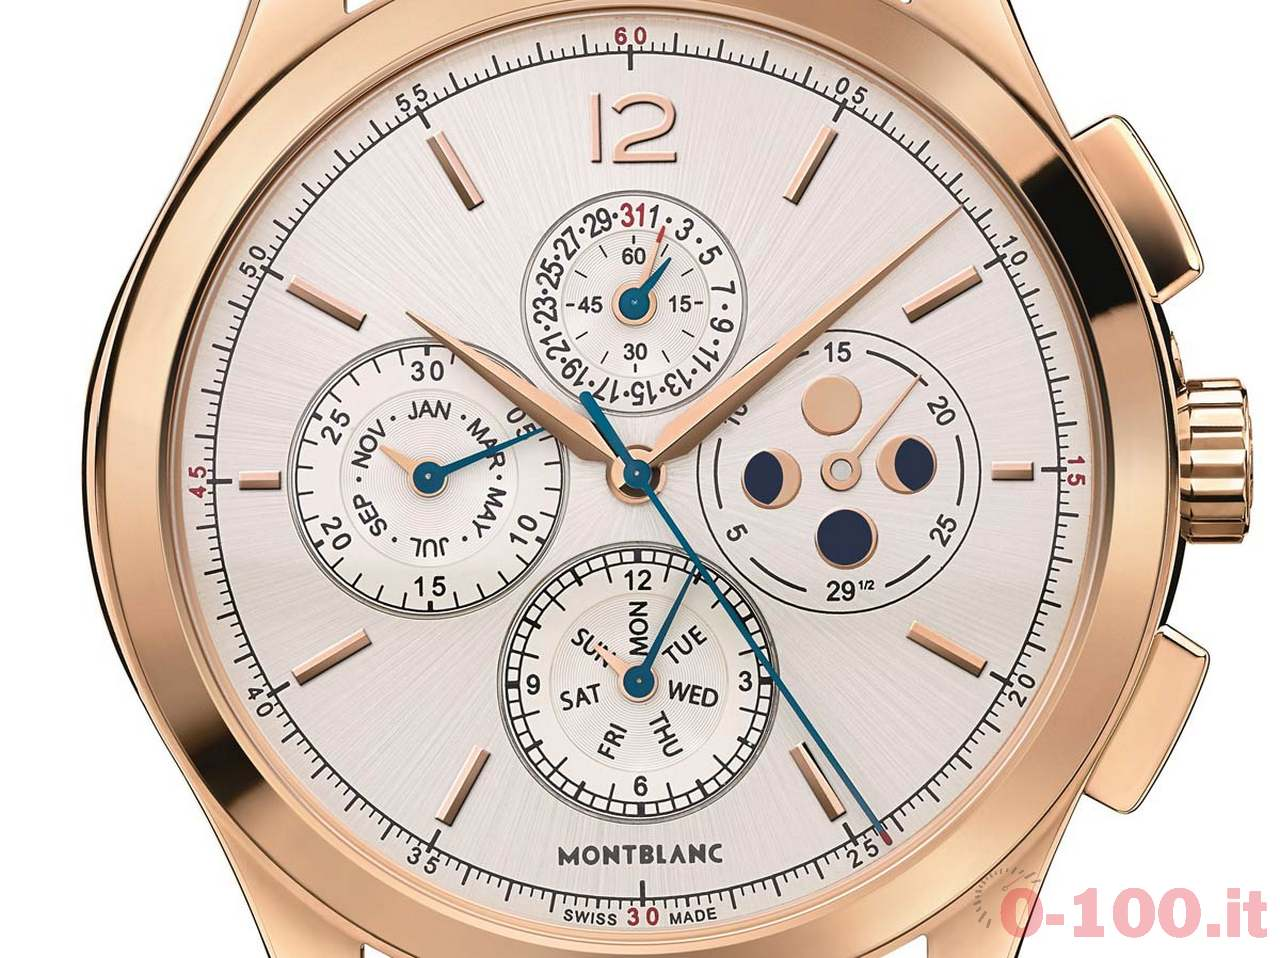 anteprima-sihh-2016-montblanc-heritage-chronometrie-chronograph-quantieme-annuel-ref-114876-prezzo-price_0-1002